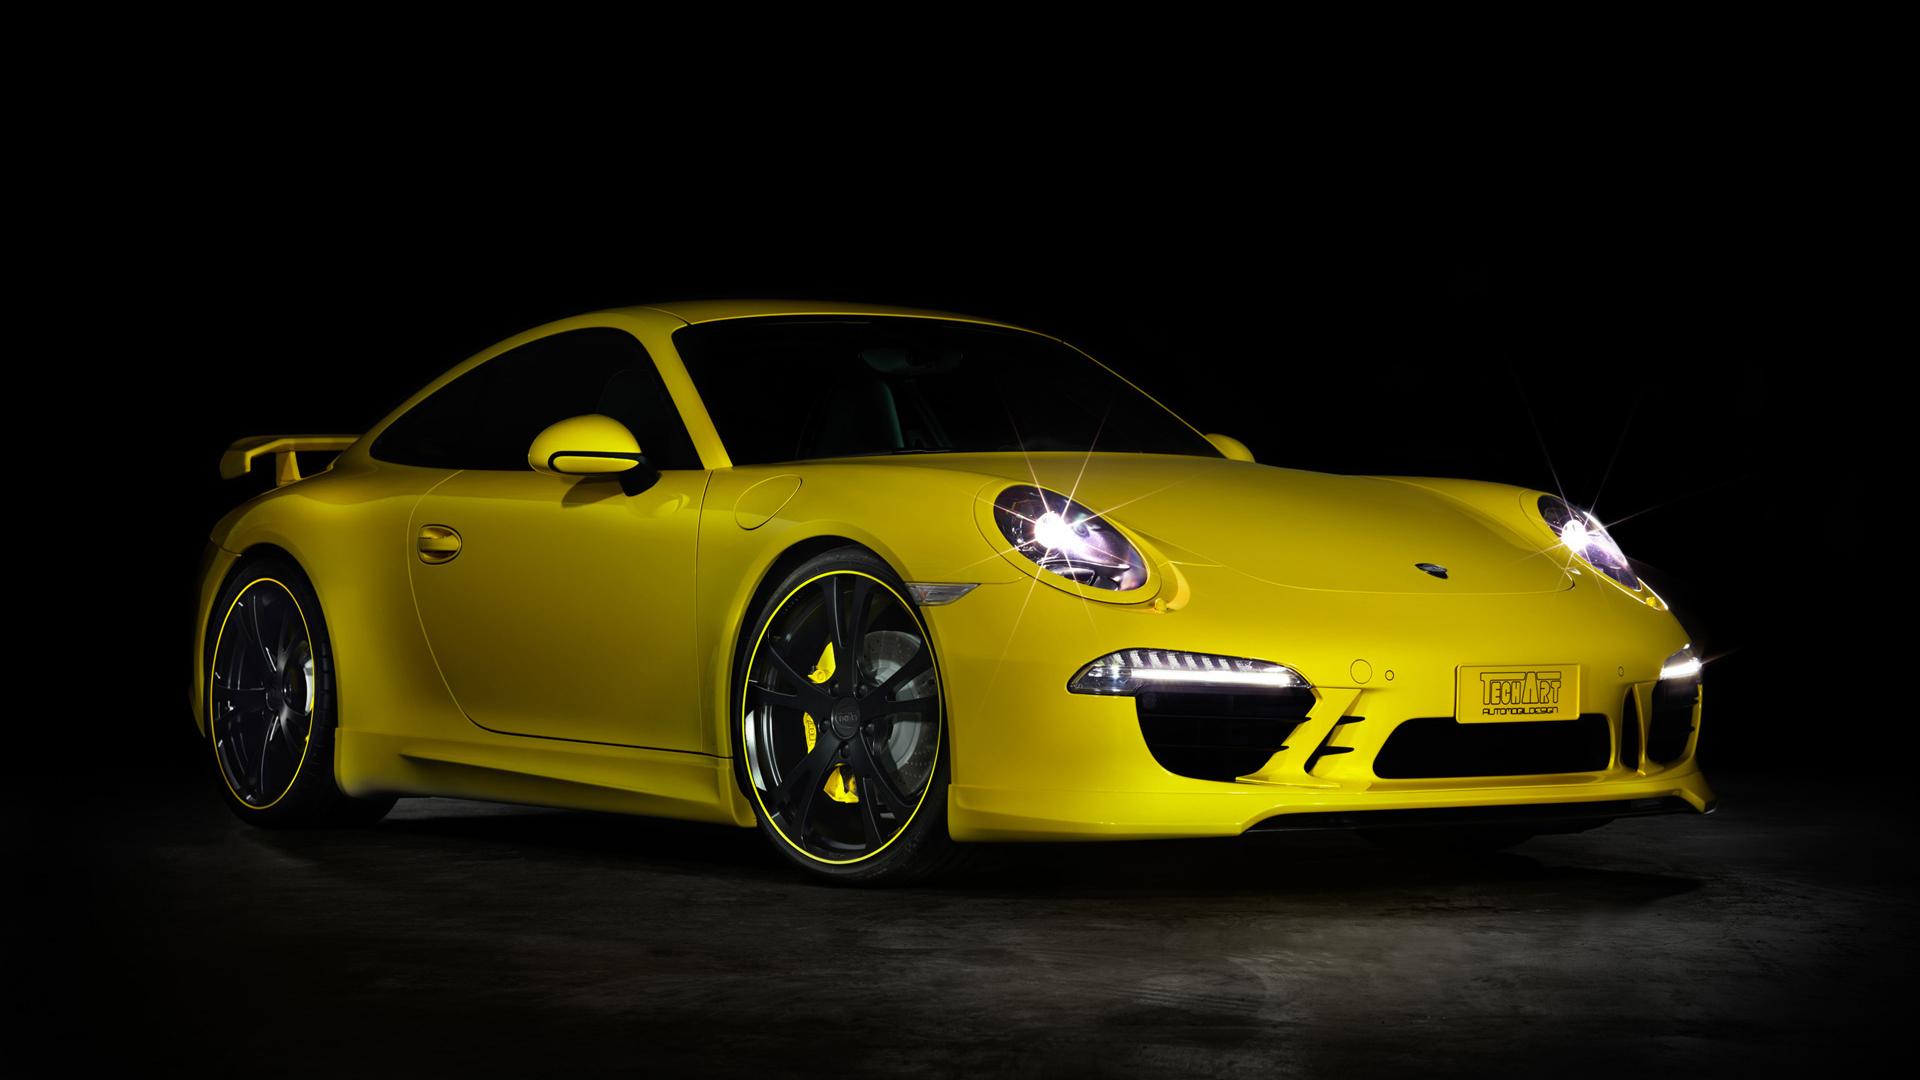 Car Porsche Porsche 911 Sport Car Yellow Car 1920x1080